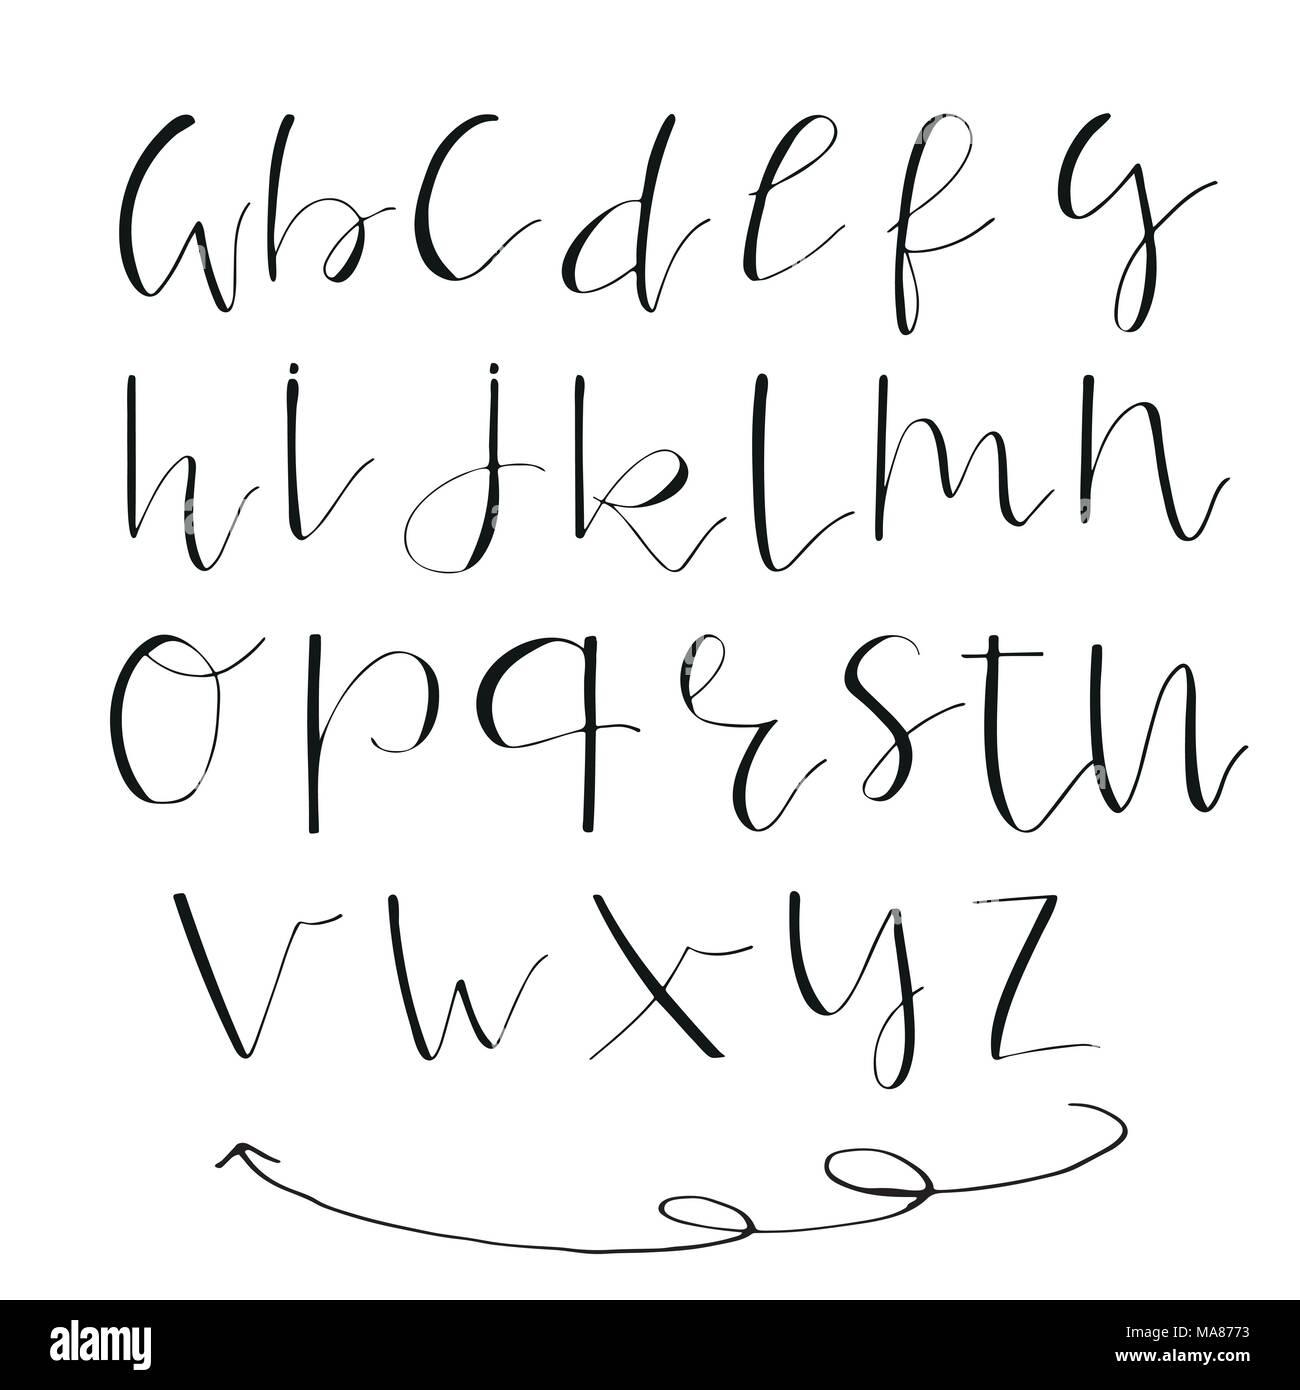 Cursive Handwriting Stock Vector Images